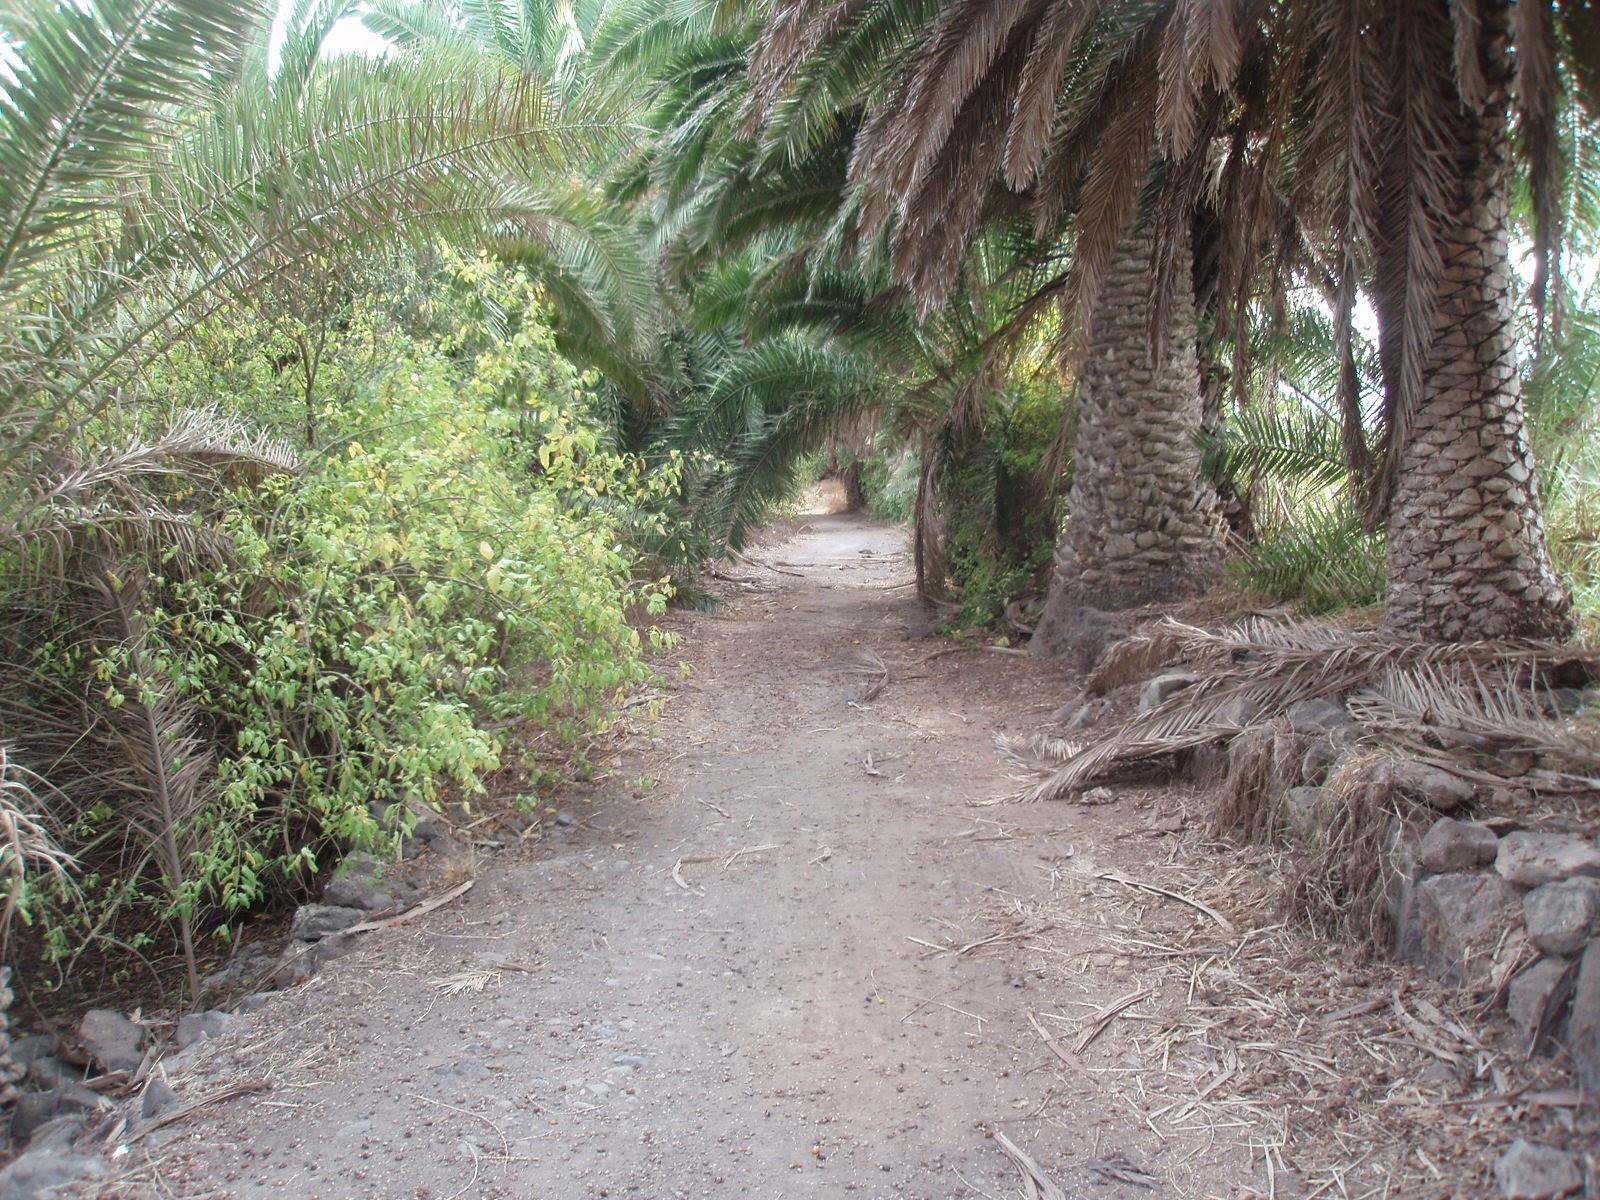 Camino de Salvago